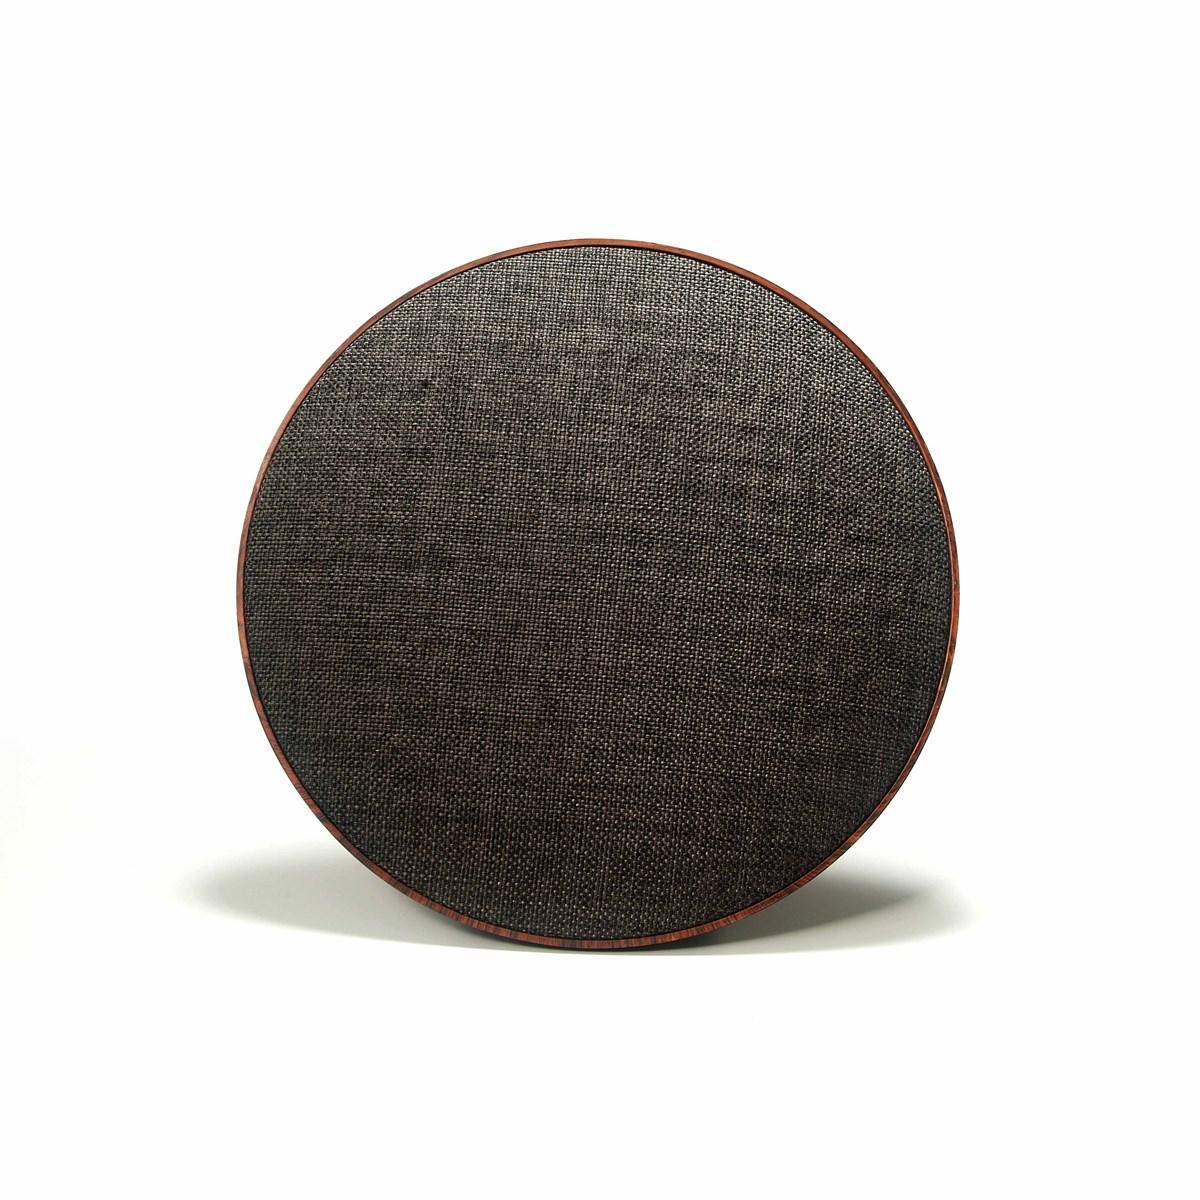 Livoo Haut-parleur compatible Bluetooth en ABS Marron